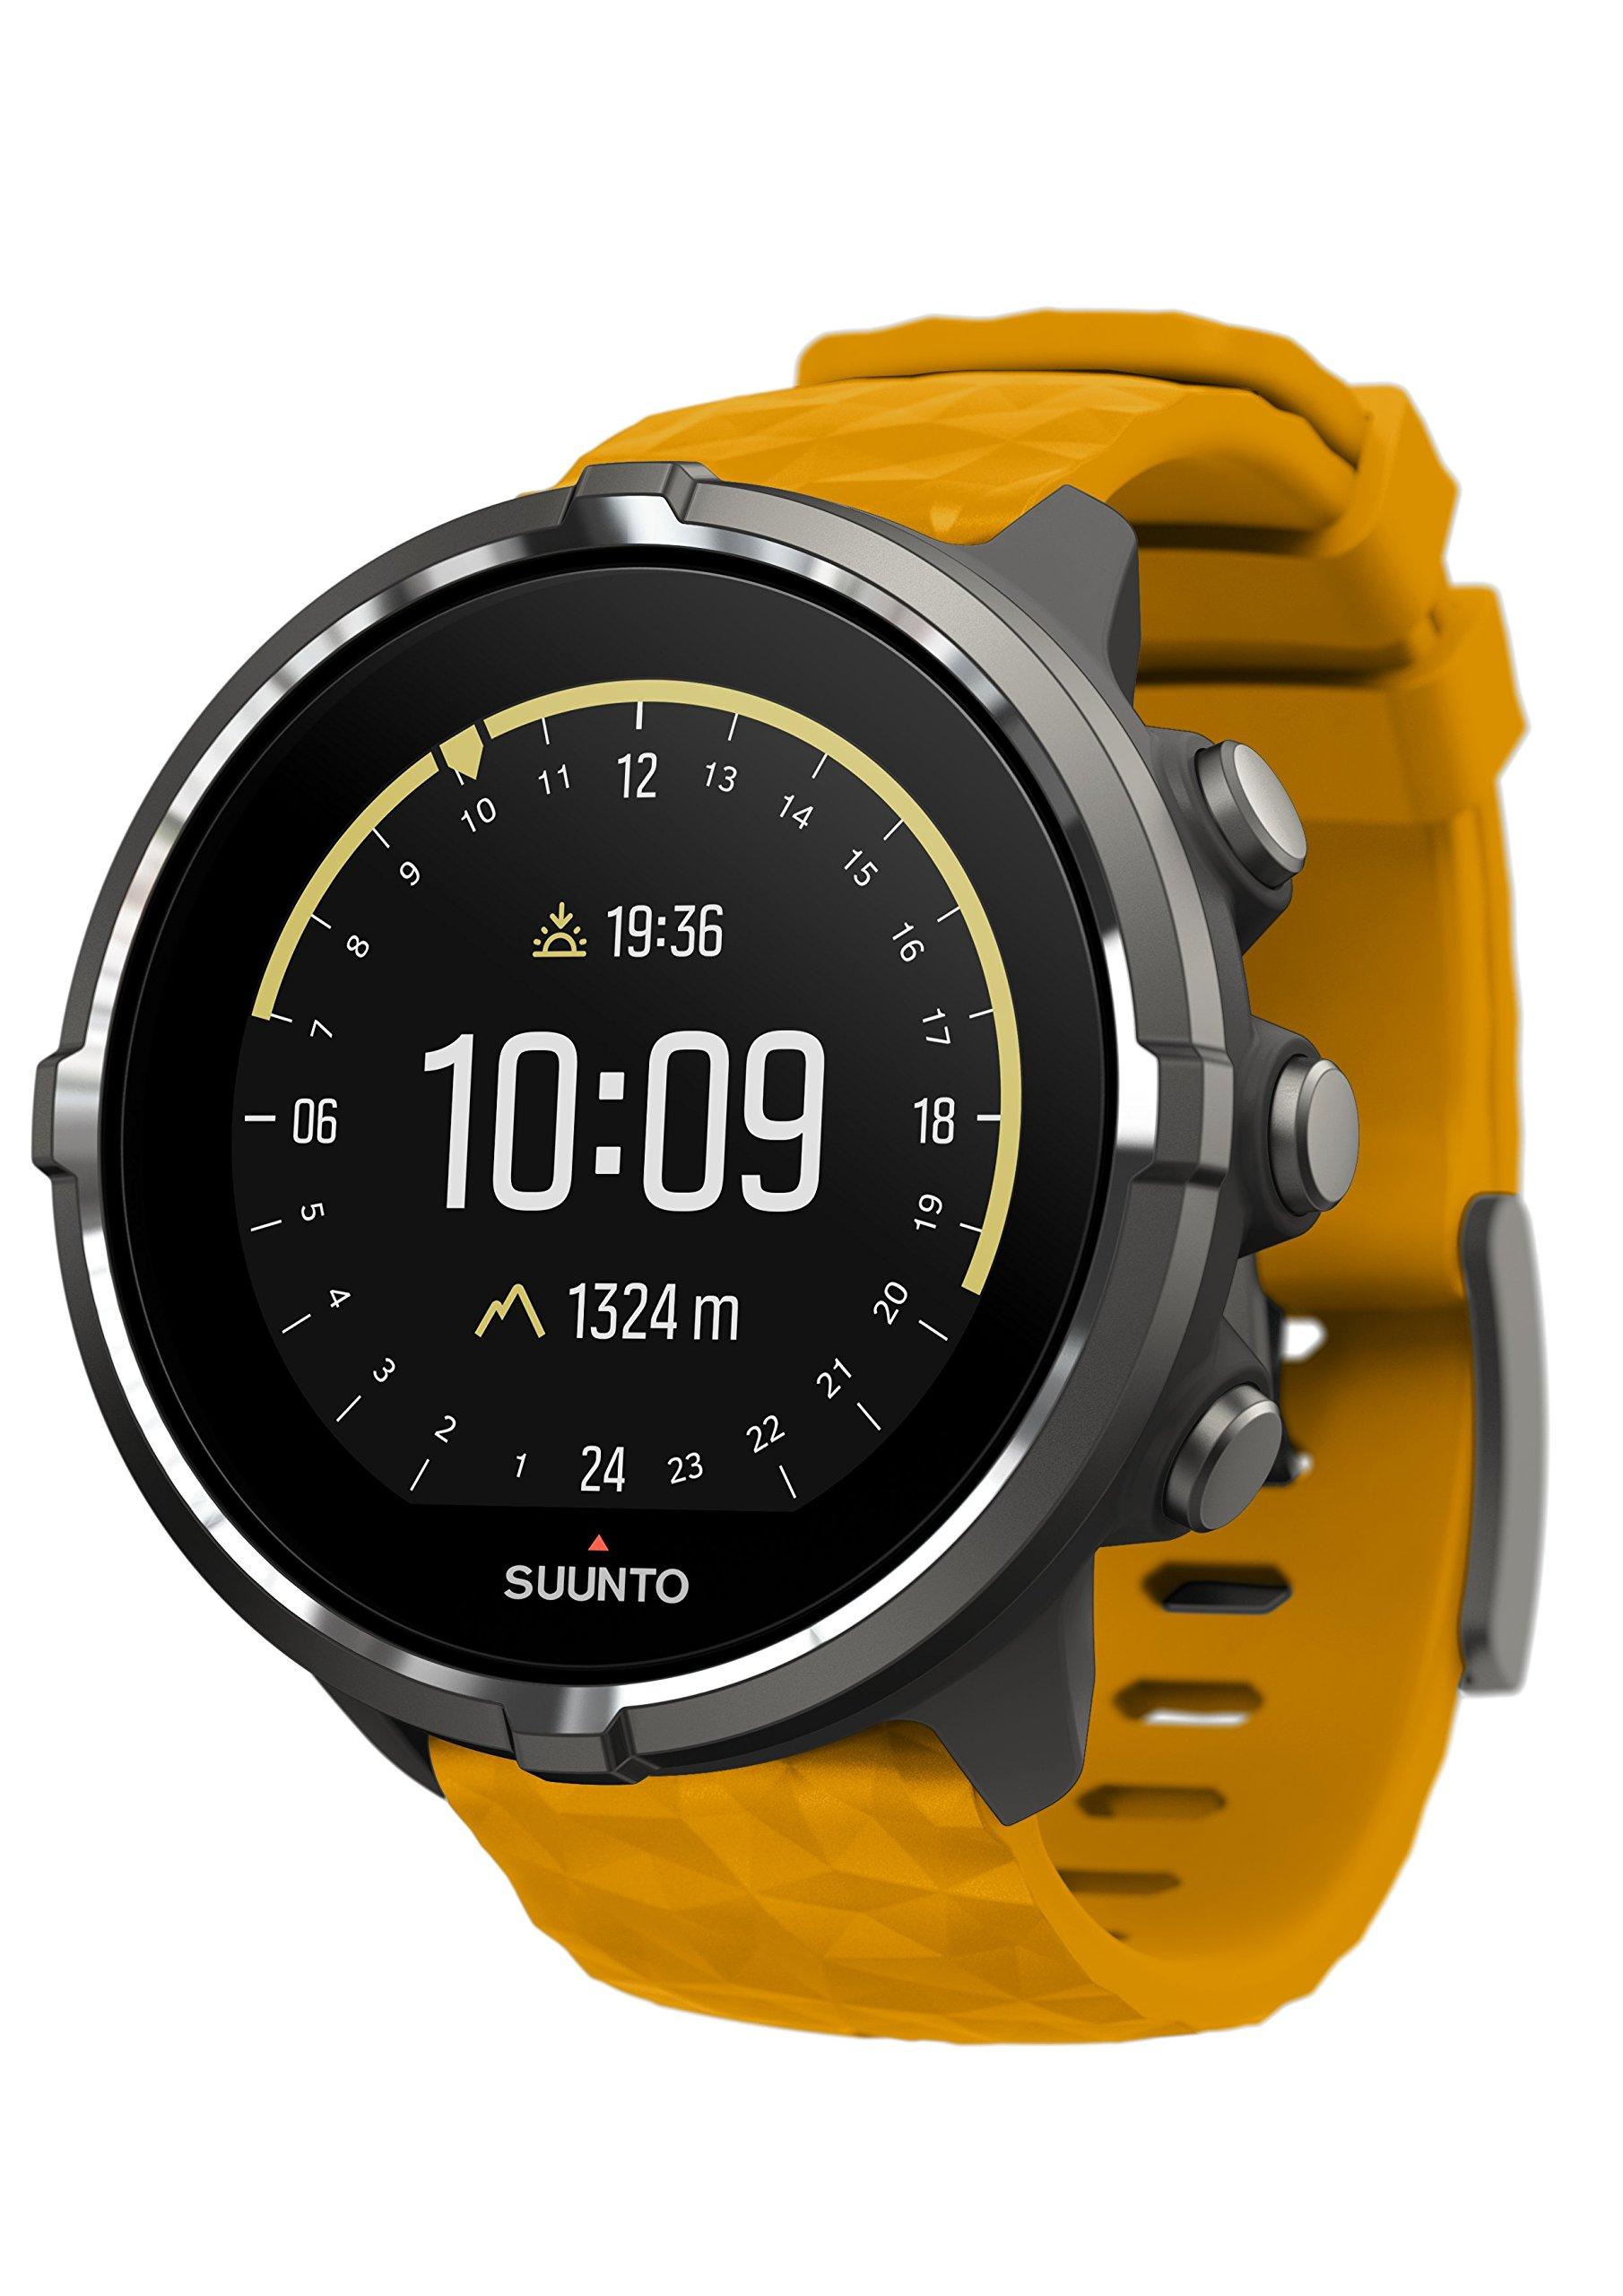 Suunto Sport Wrist HR Baro Amber Watch